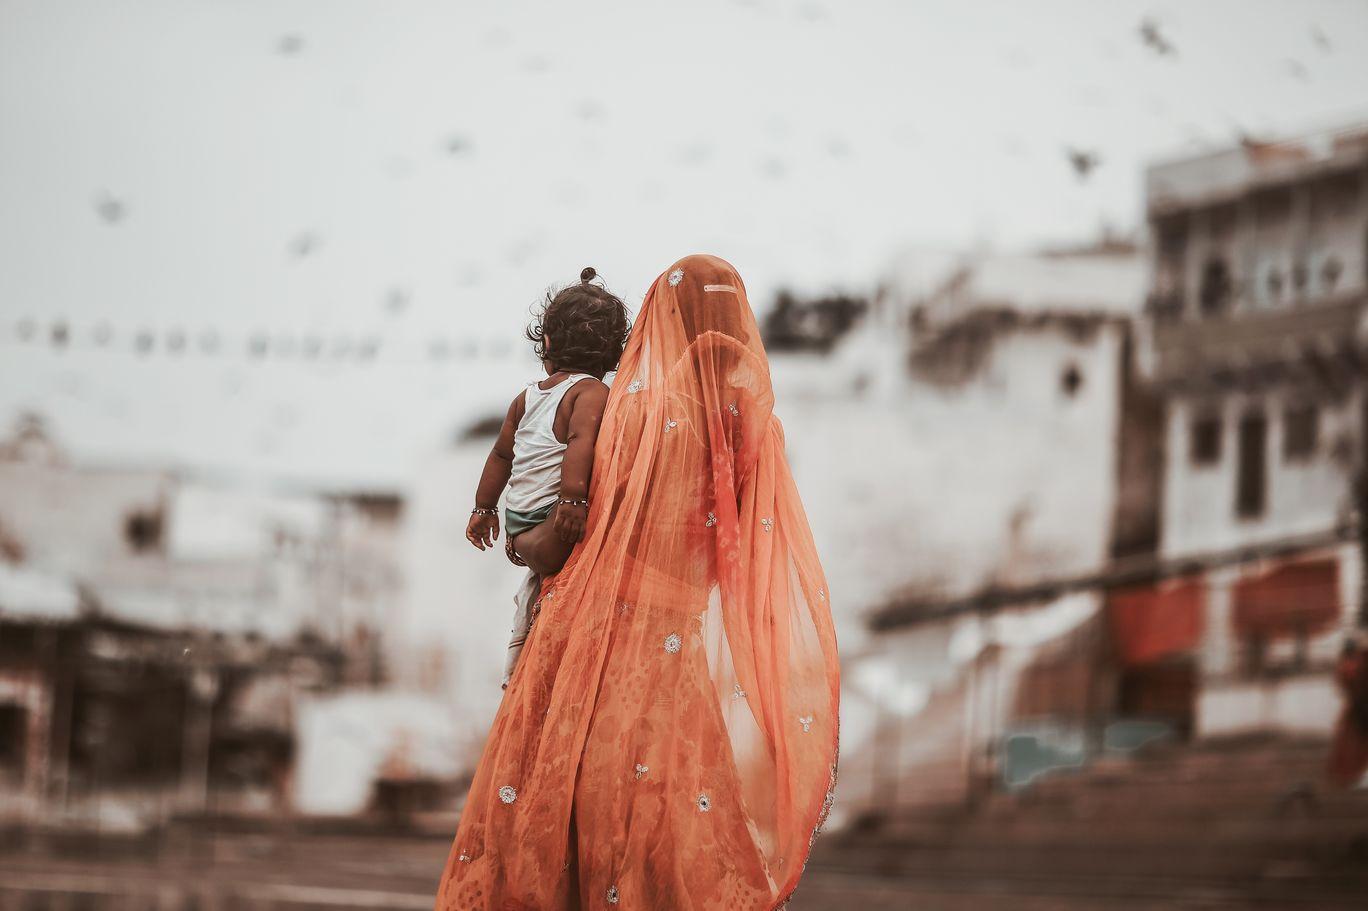 Photo of Pushkar By surya